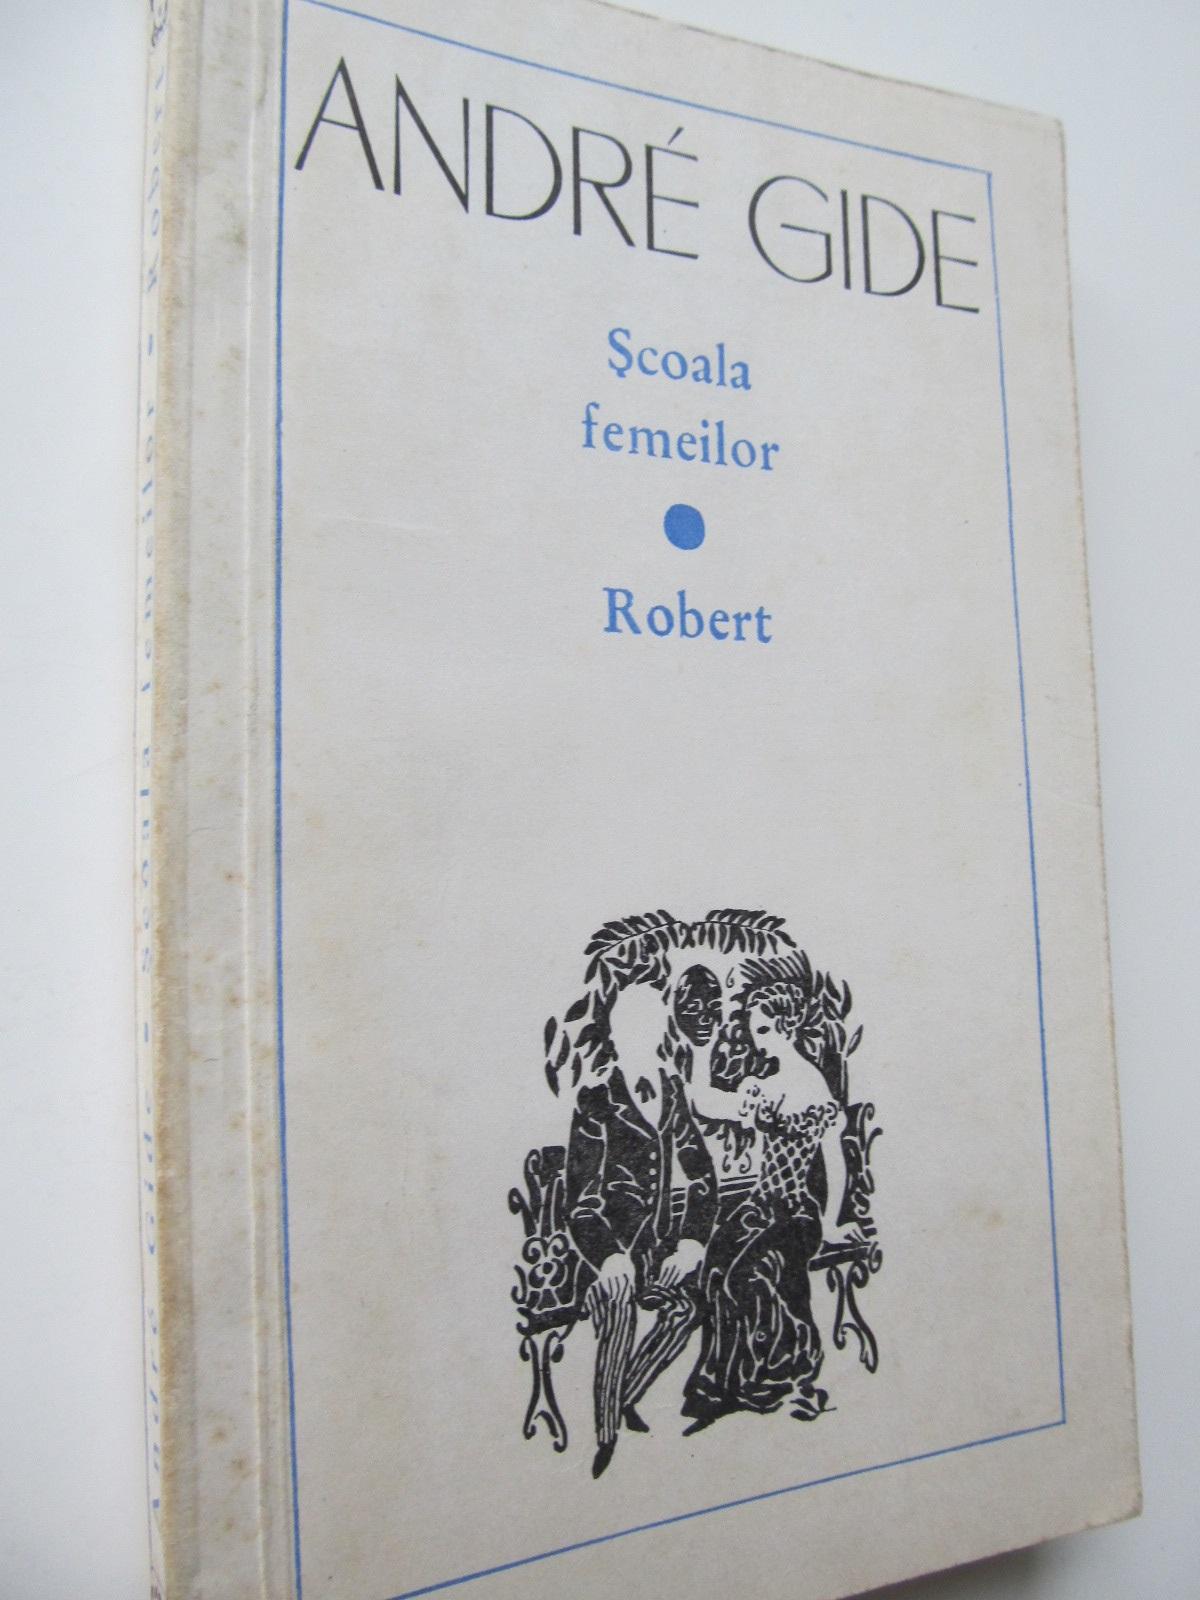 Scoala femeilor - Robert - Andre Gide | Detalii carte